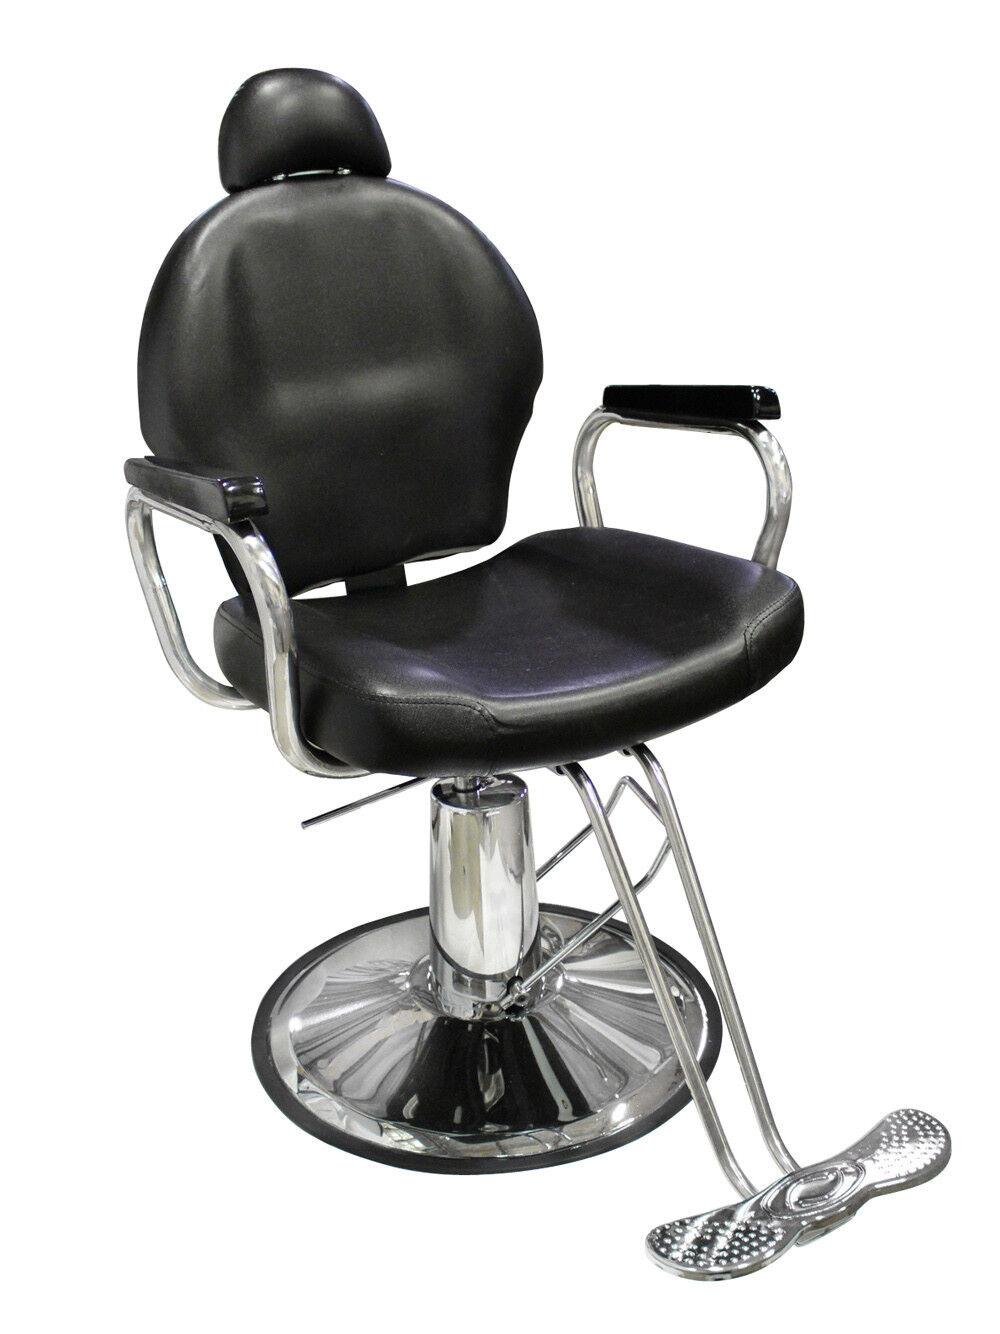 New Reclining Hydraulic Barber Chair Salon Styling Beauty